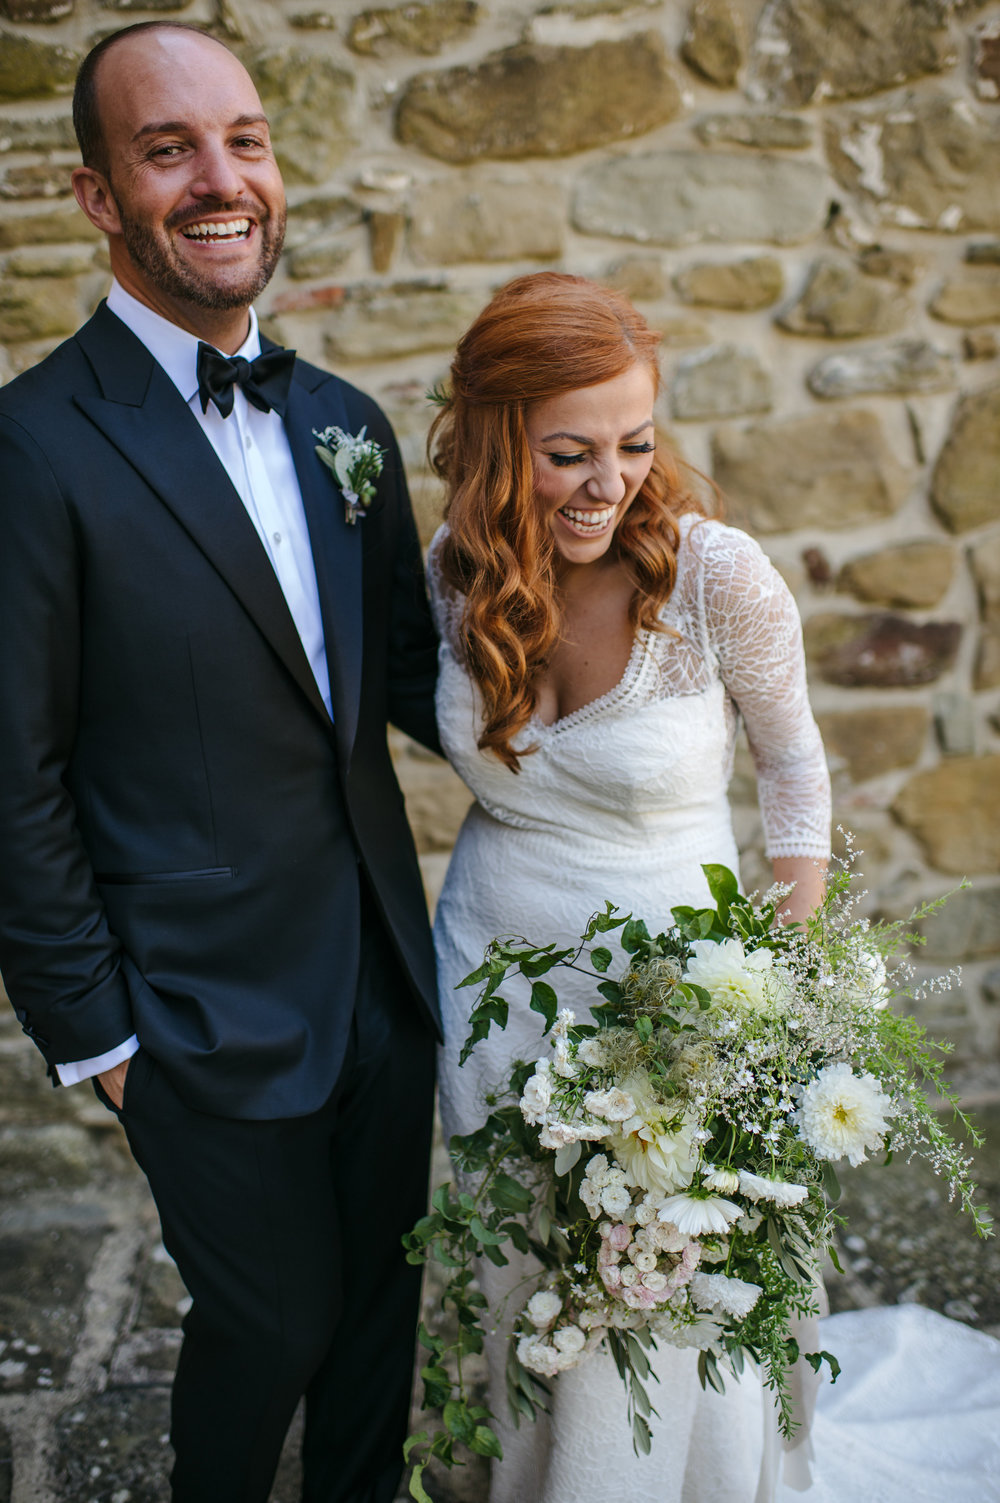 Amanda_Dumouchelle_Photography_Italy_Wedding00517.jpg